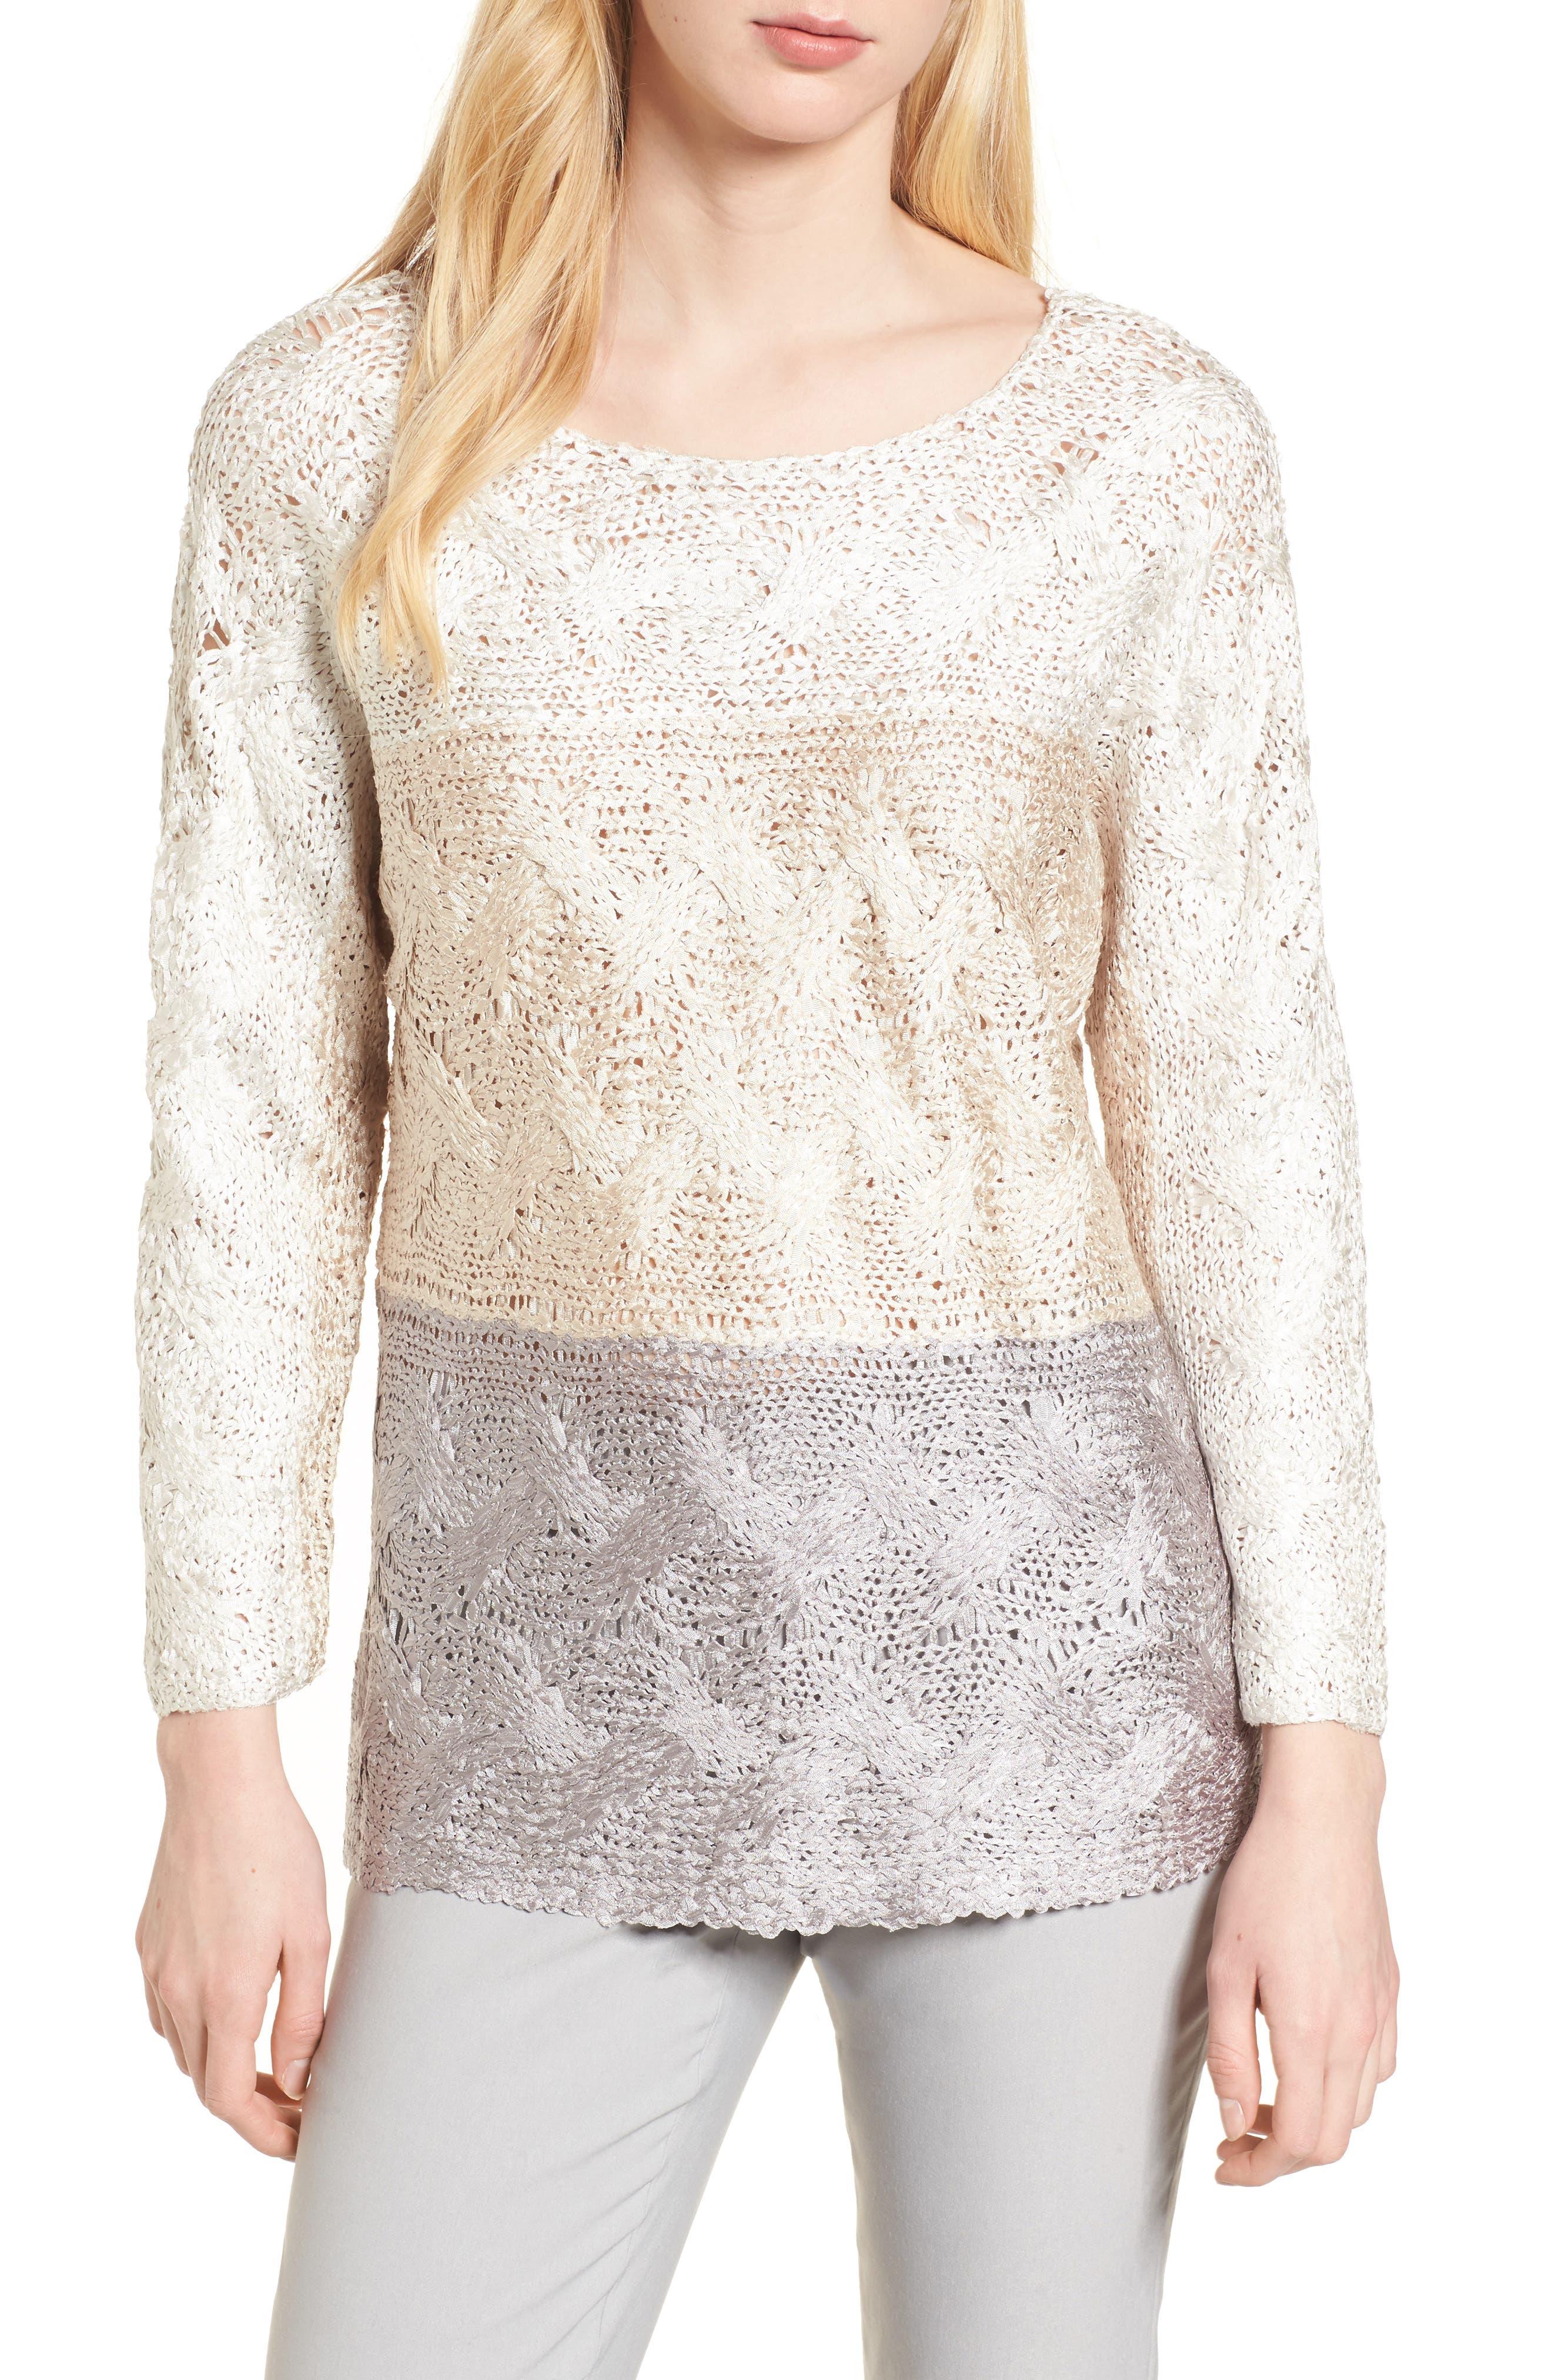 Main Image - NIC+ZOE Daydreamer Ombré Sweater